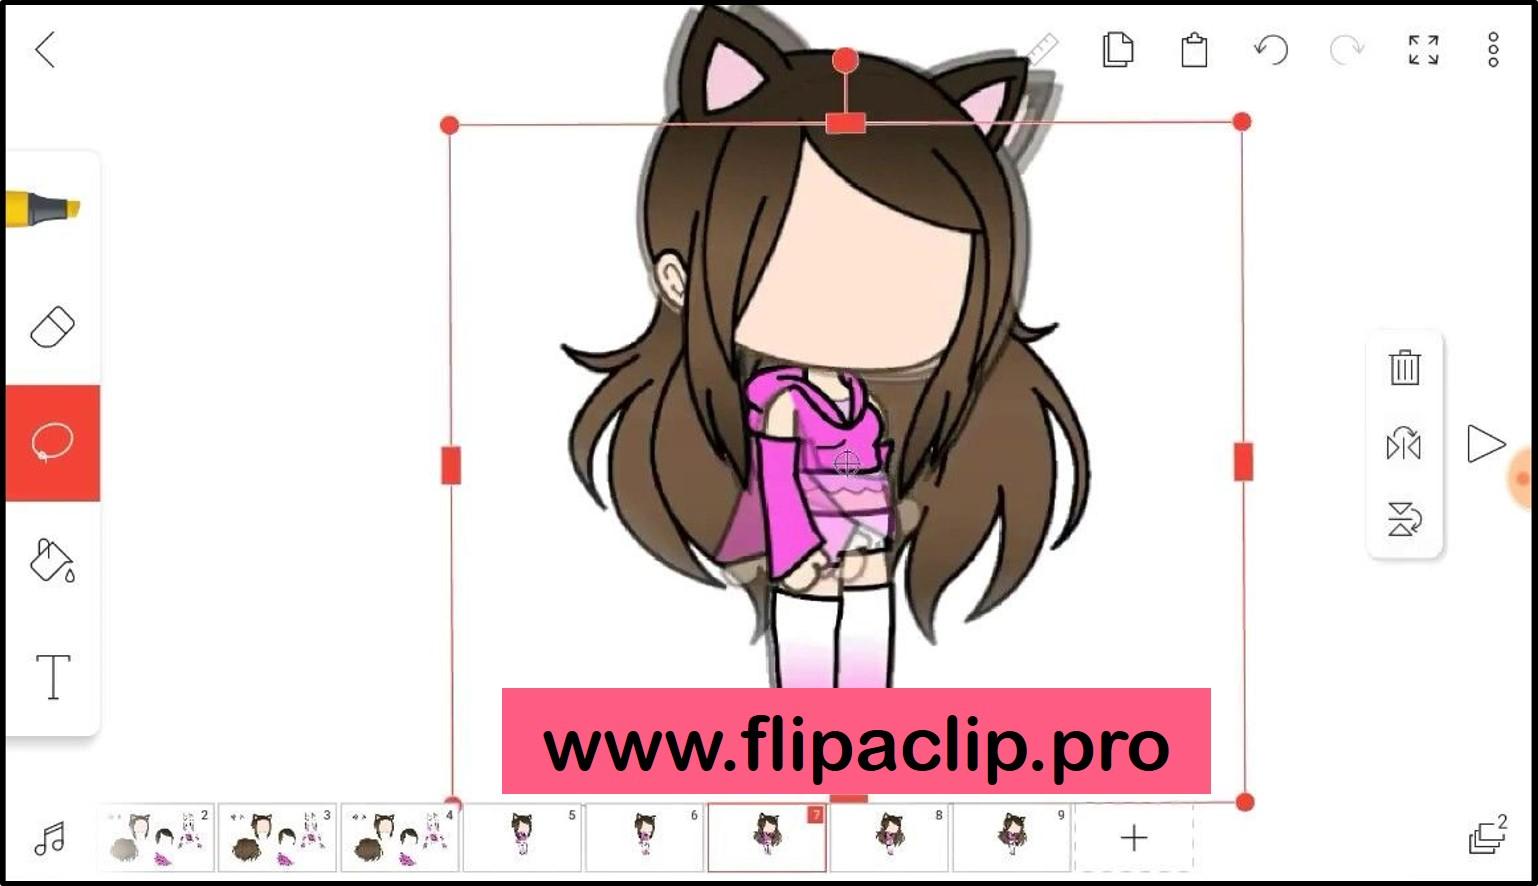 flipaclip